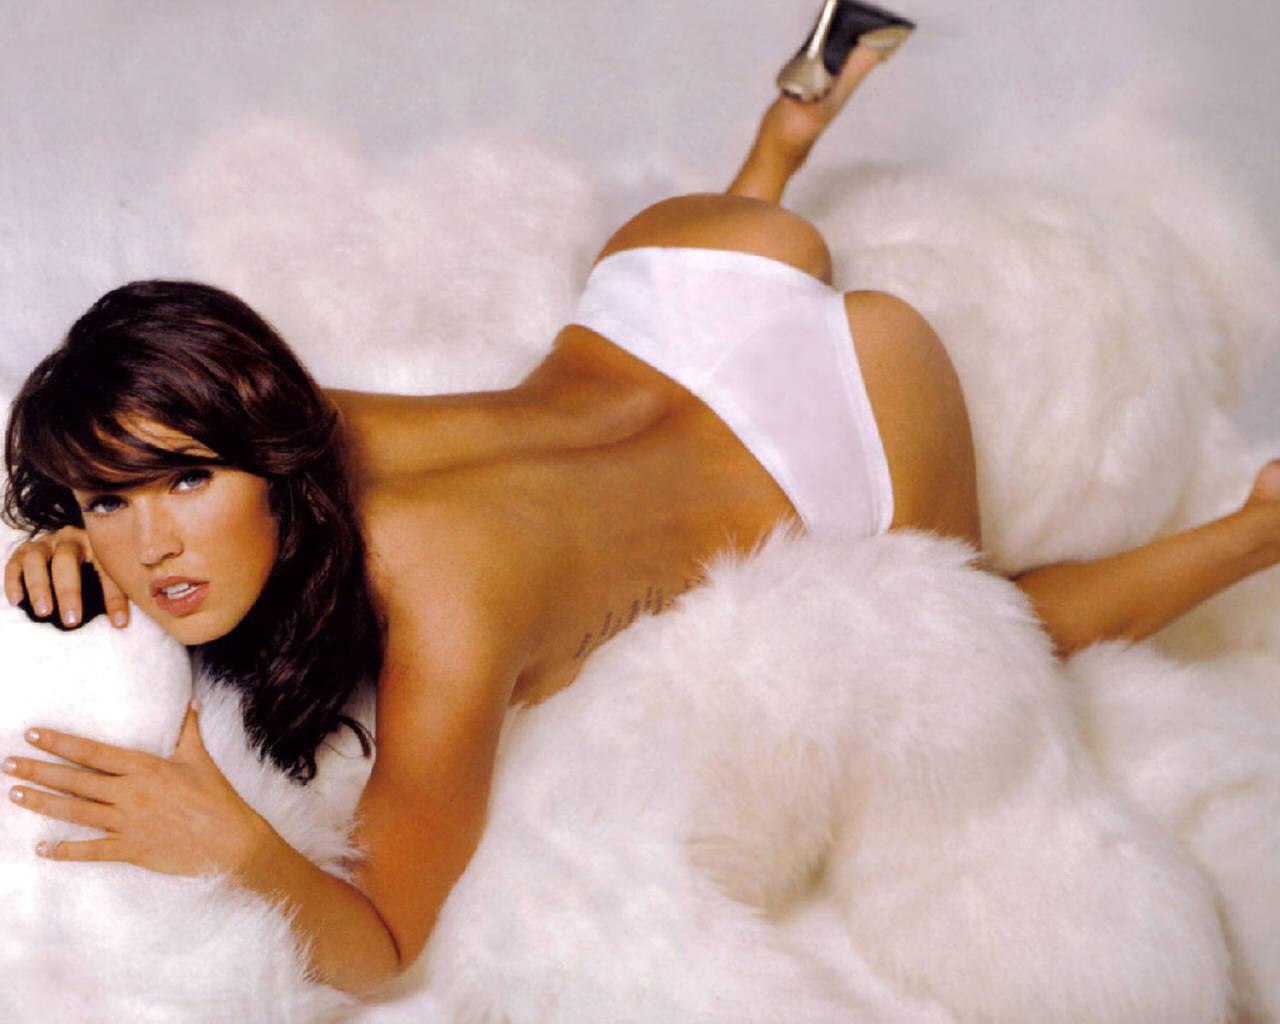 Megan Fox nude ass que tu aimes vraiment ça ????